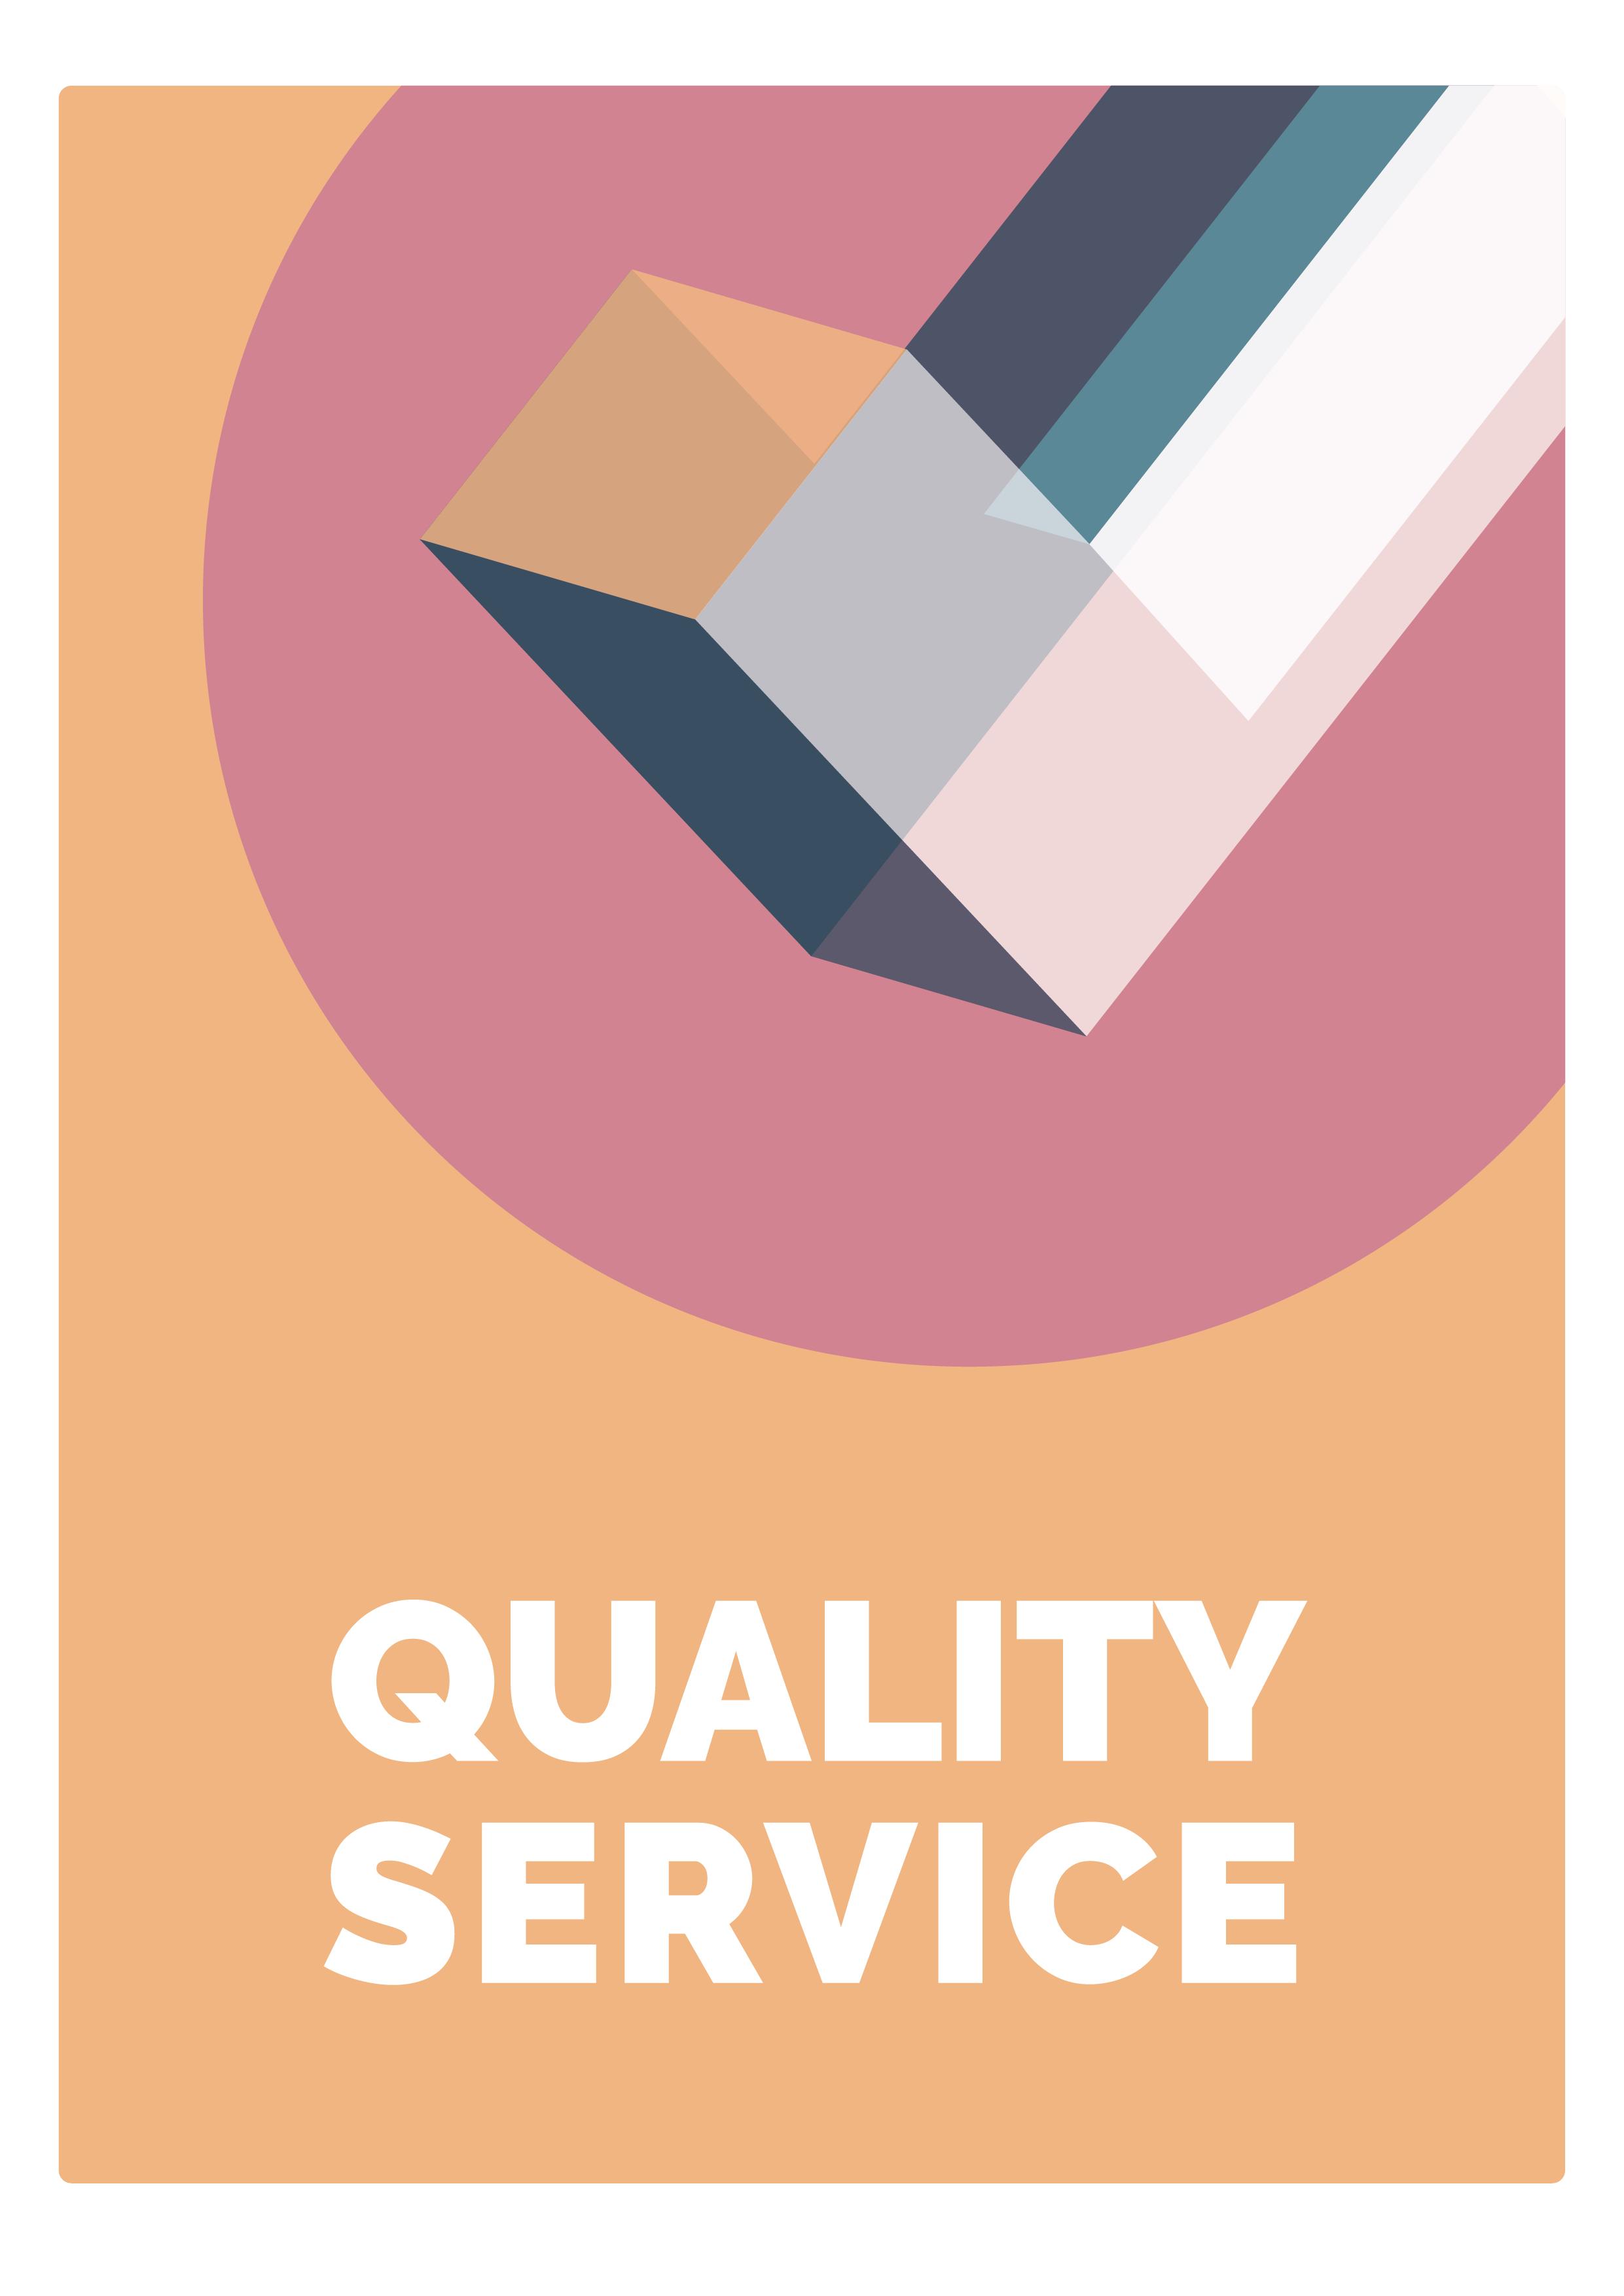 Quality Service Award logo